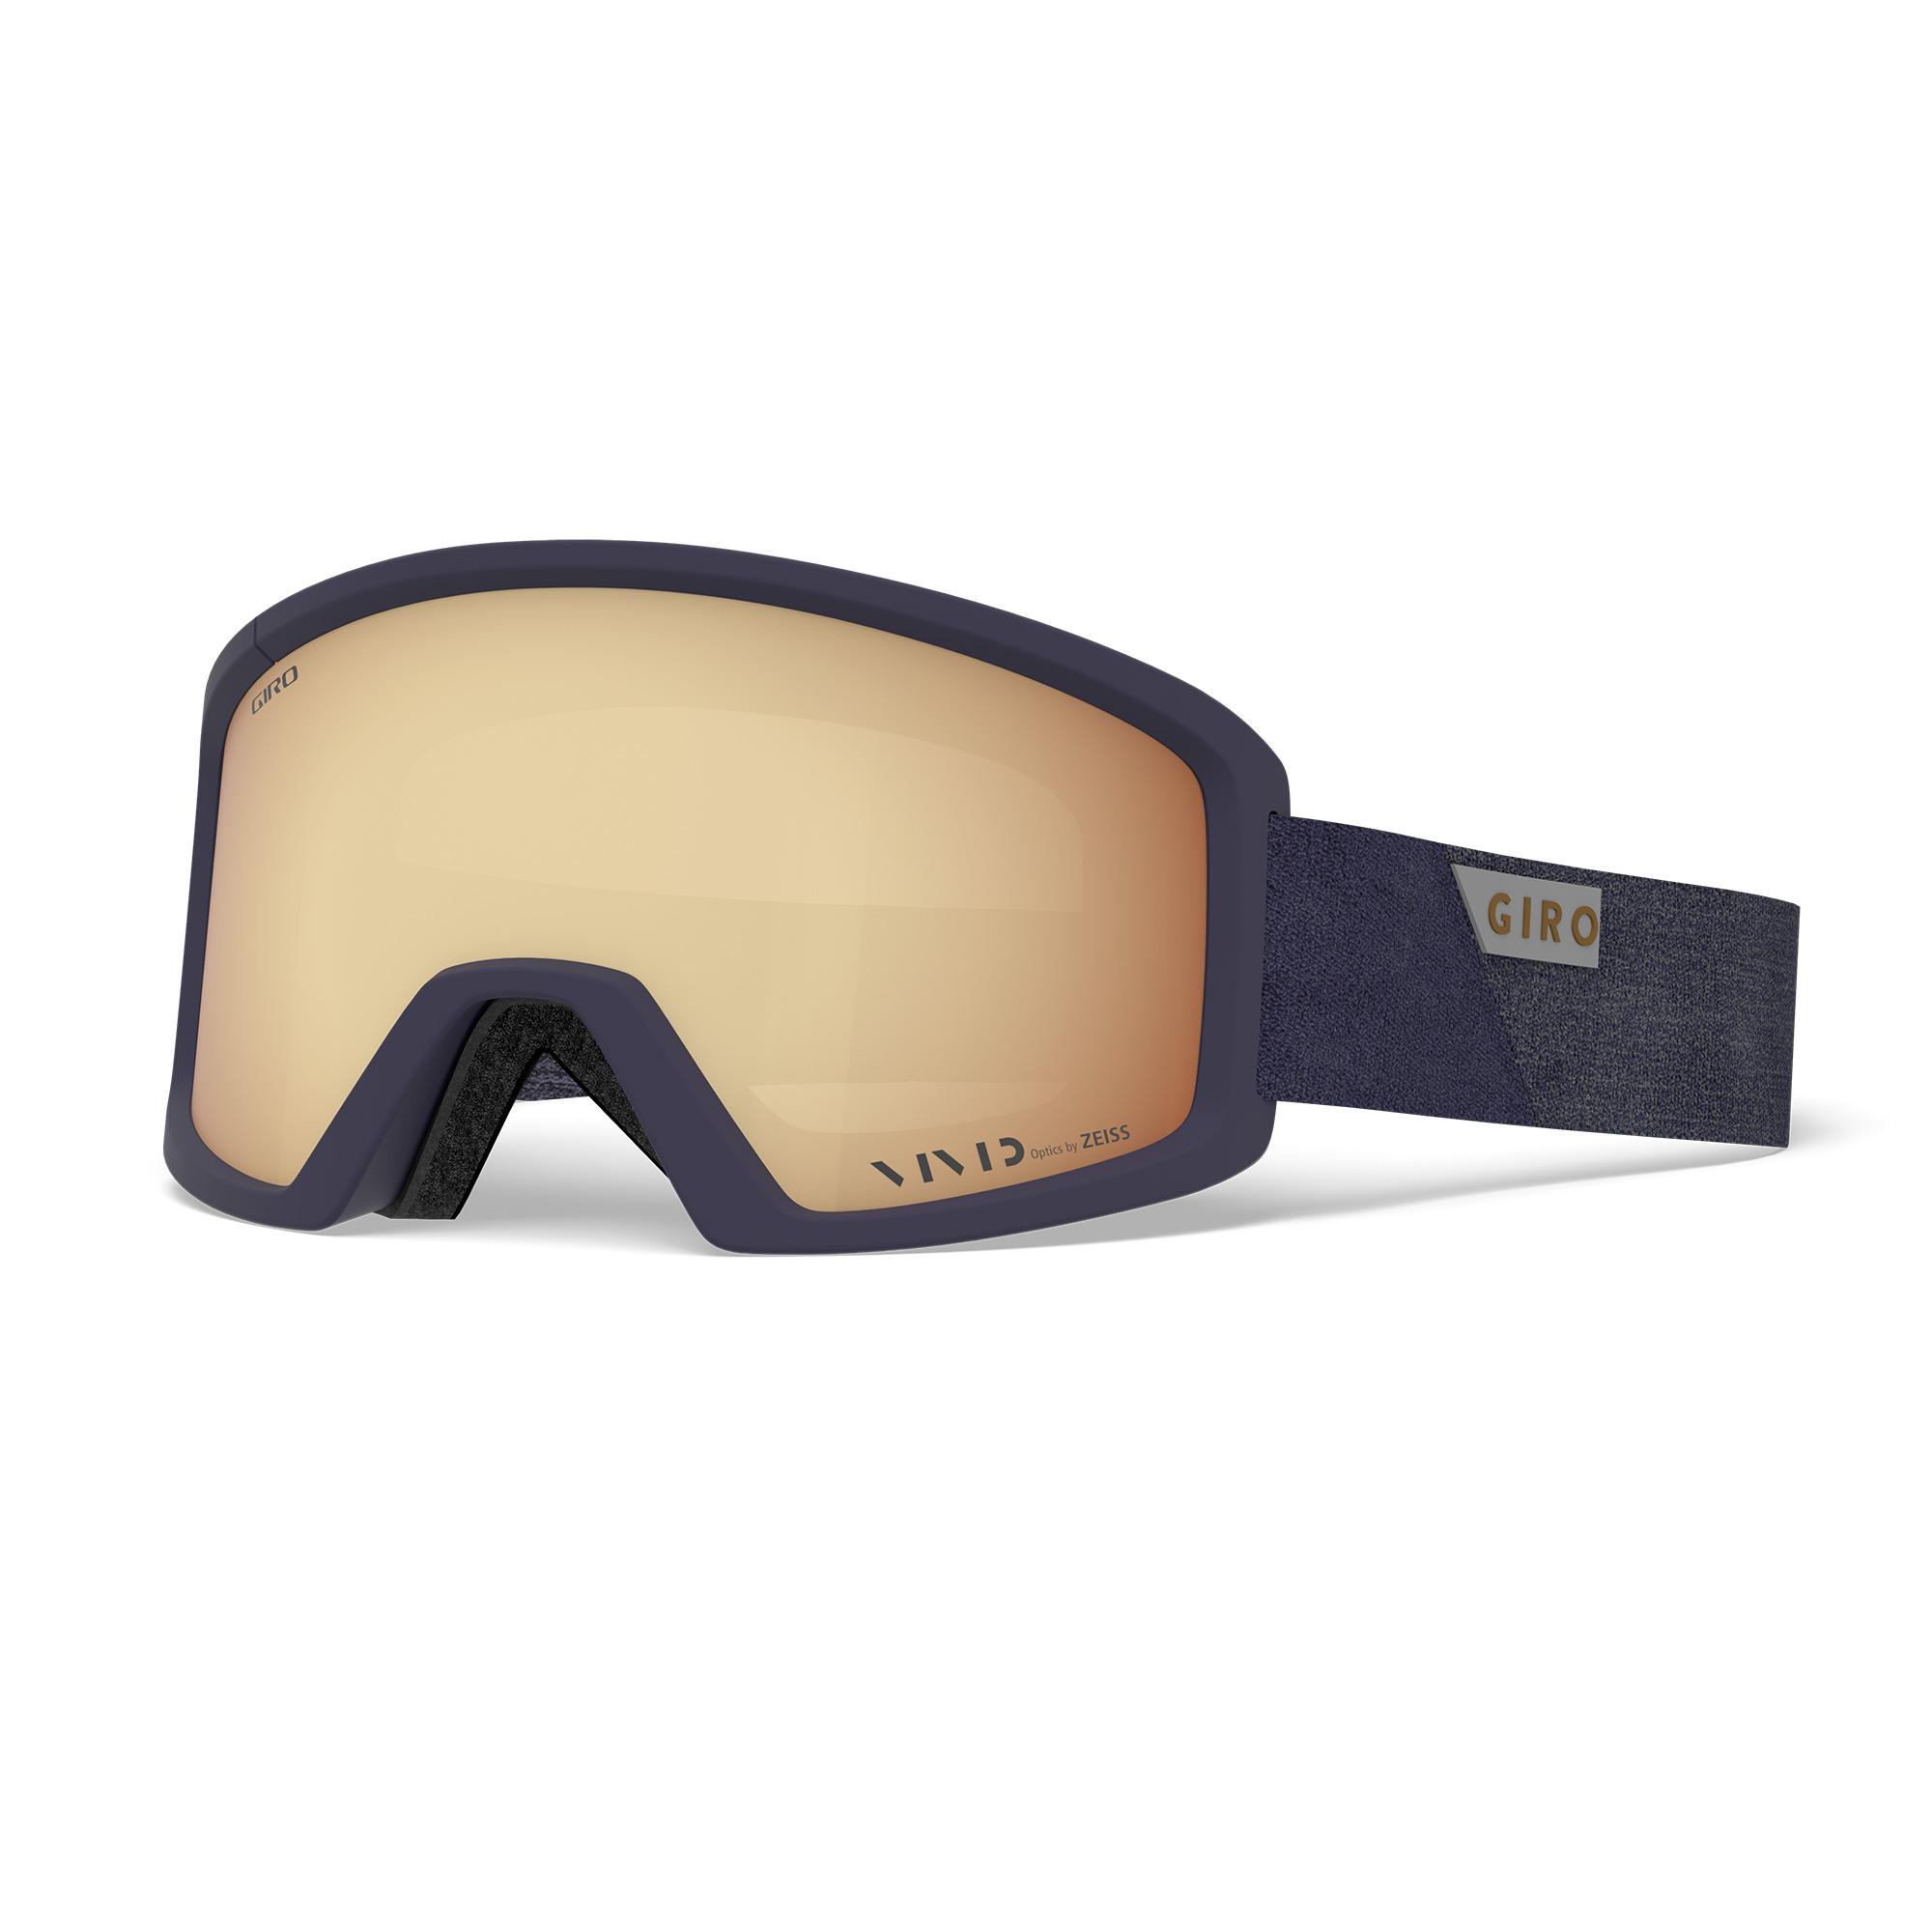 giro-blok-snow-goggle-midnight-peak-vivid-copper-7094433-hero.jpg